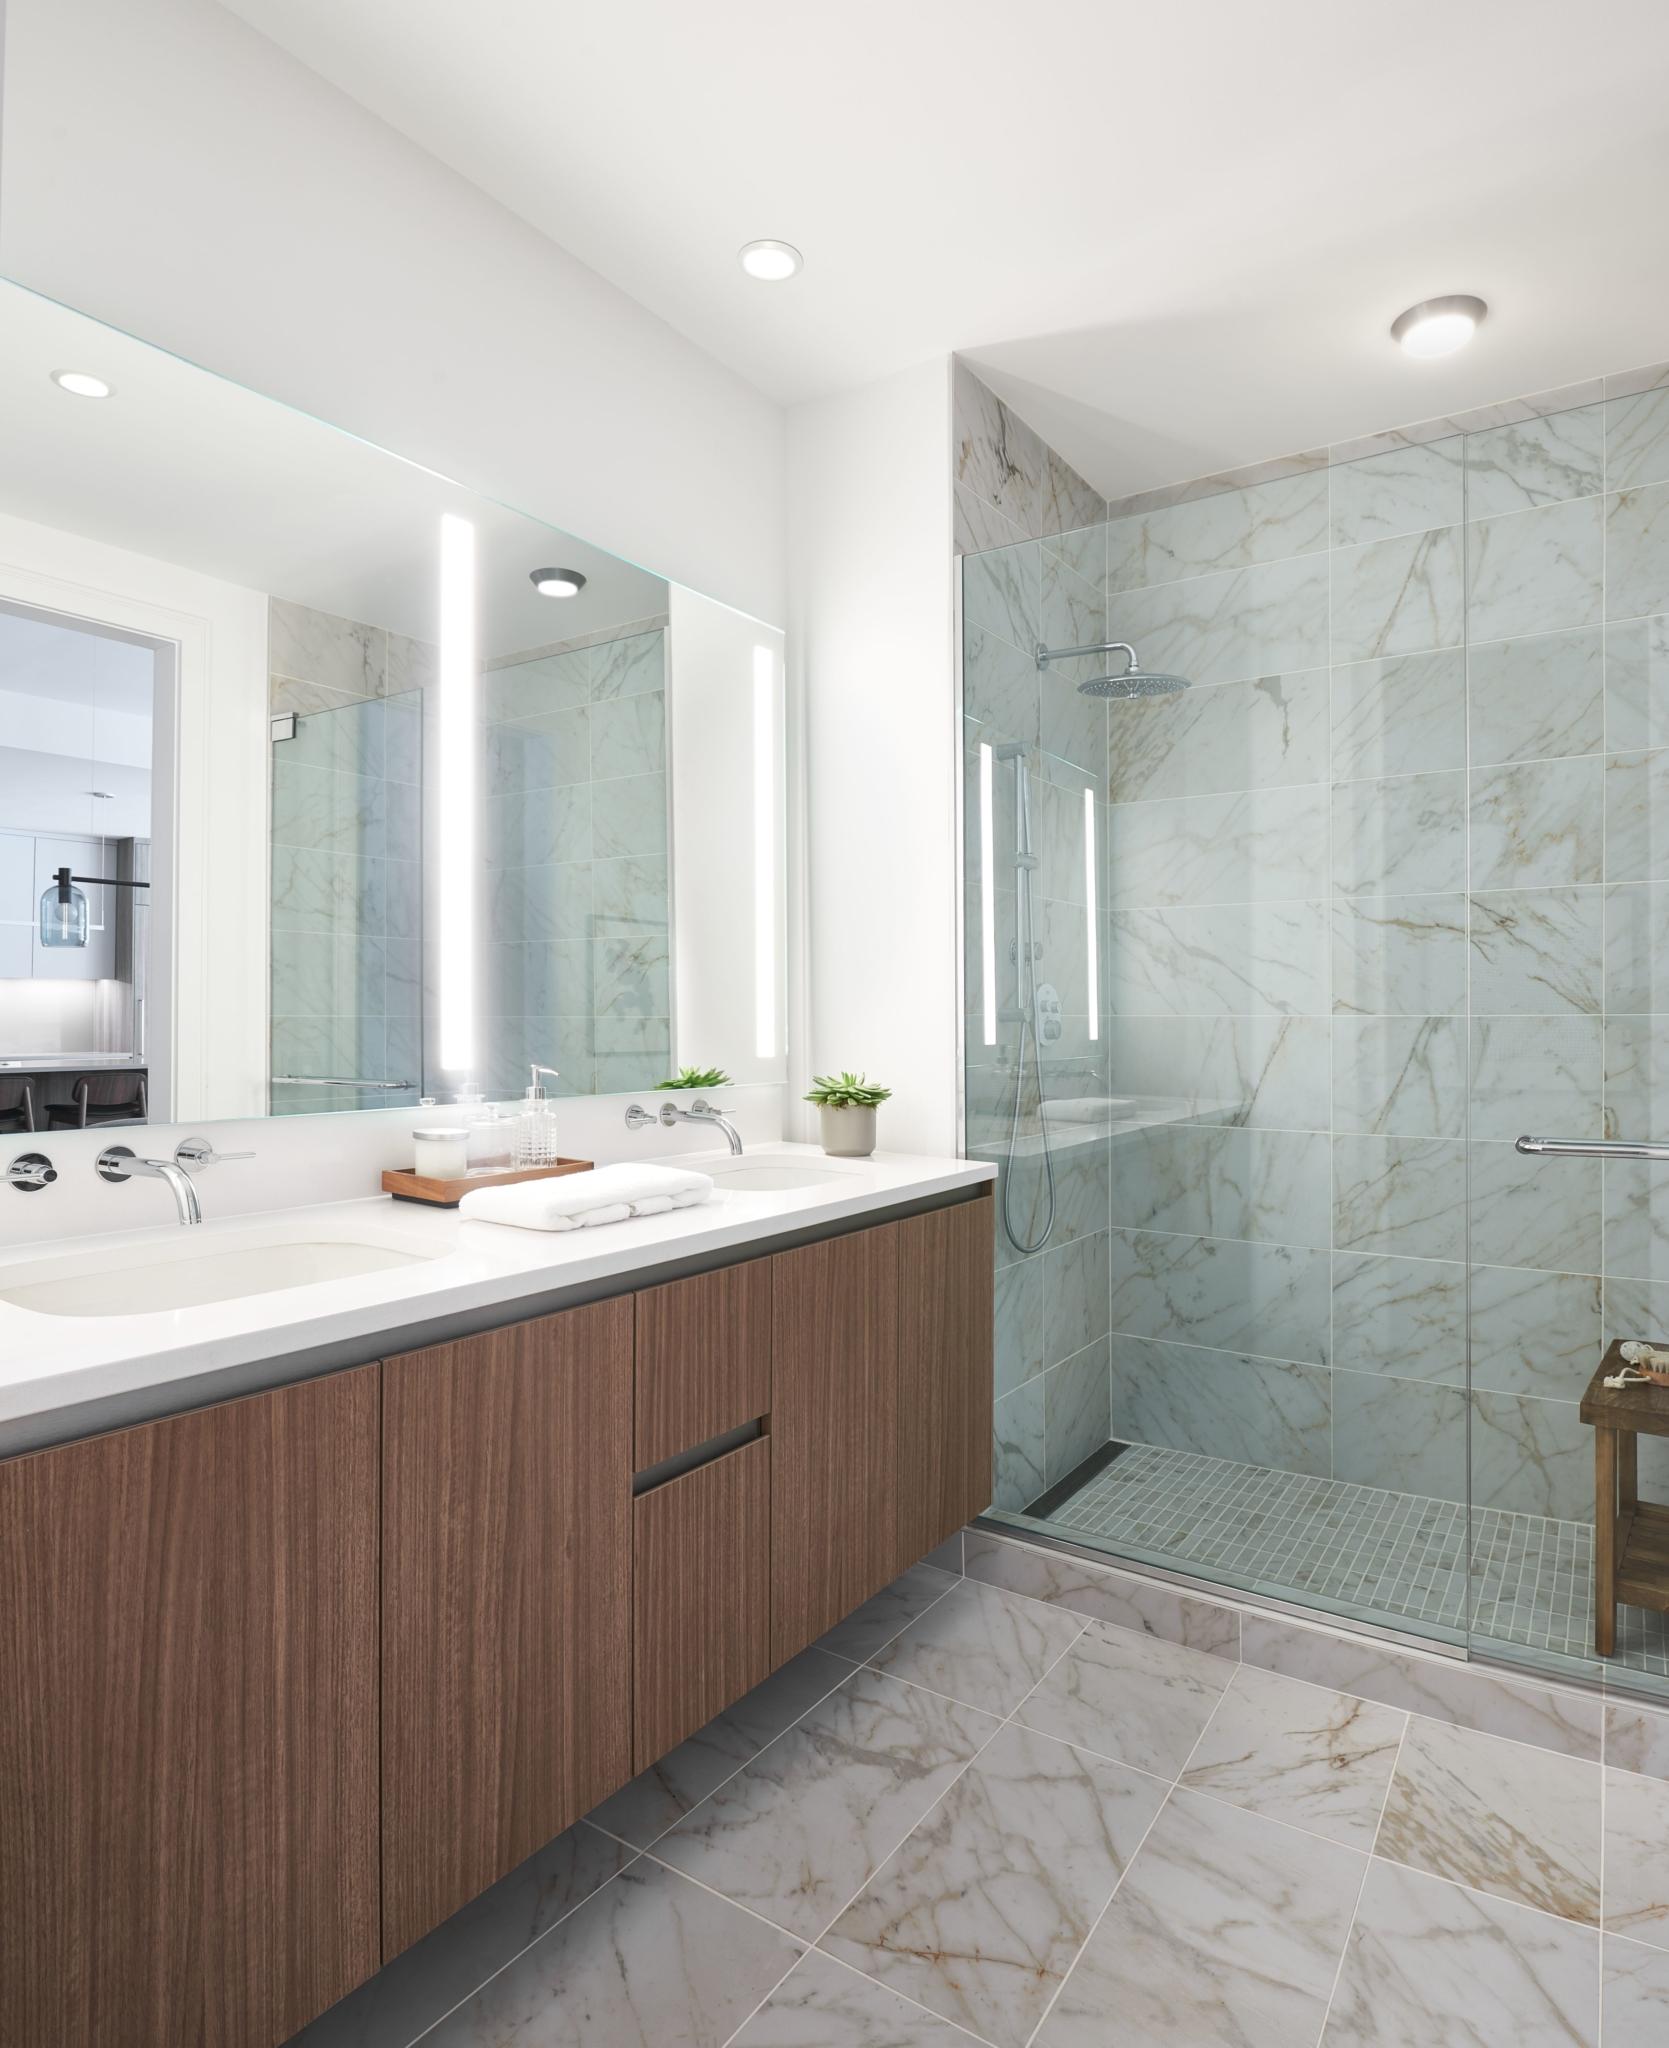 sales-center-bathrooom-scaled.jpeg